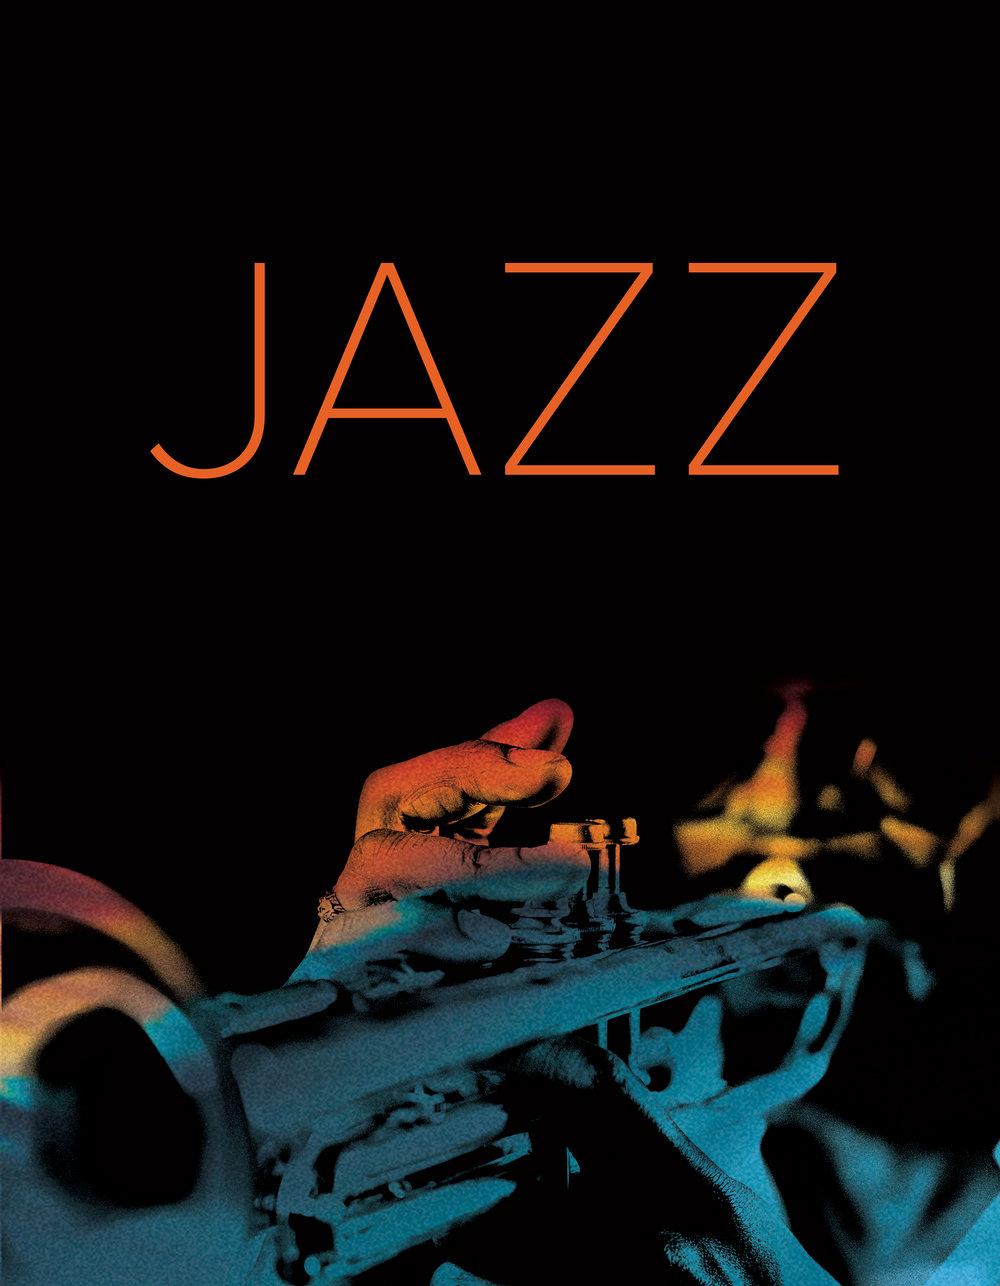 Jazz-0701-IMG01.jpg